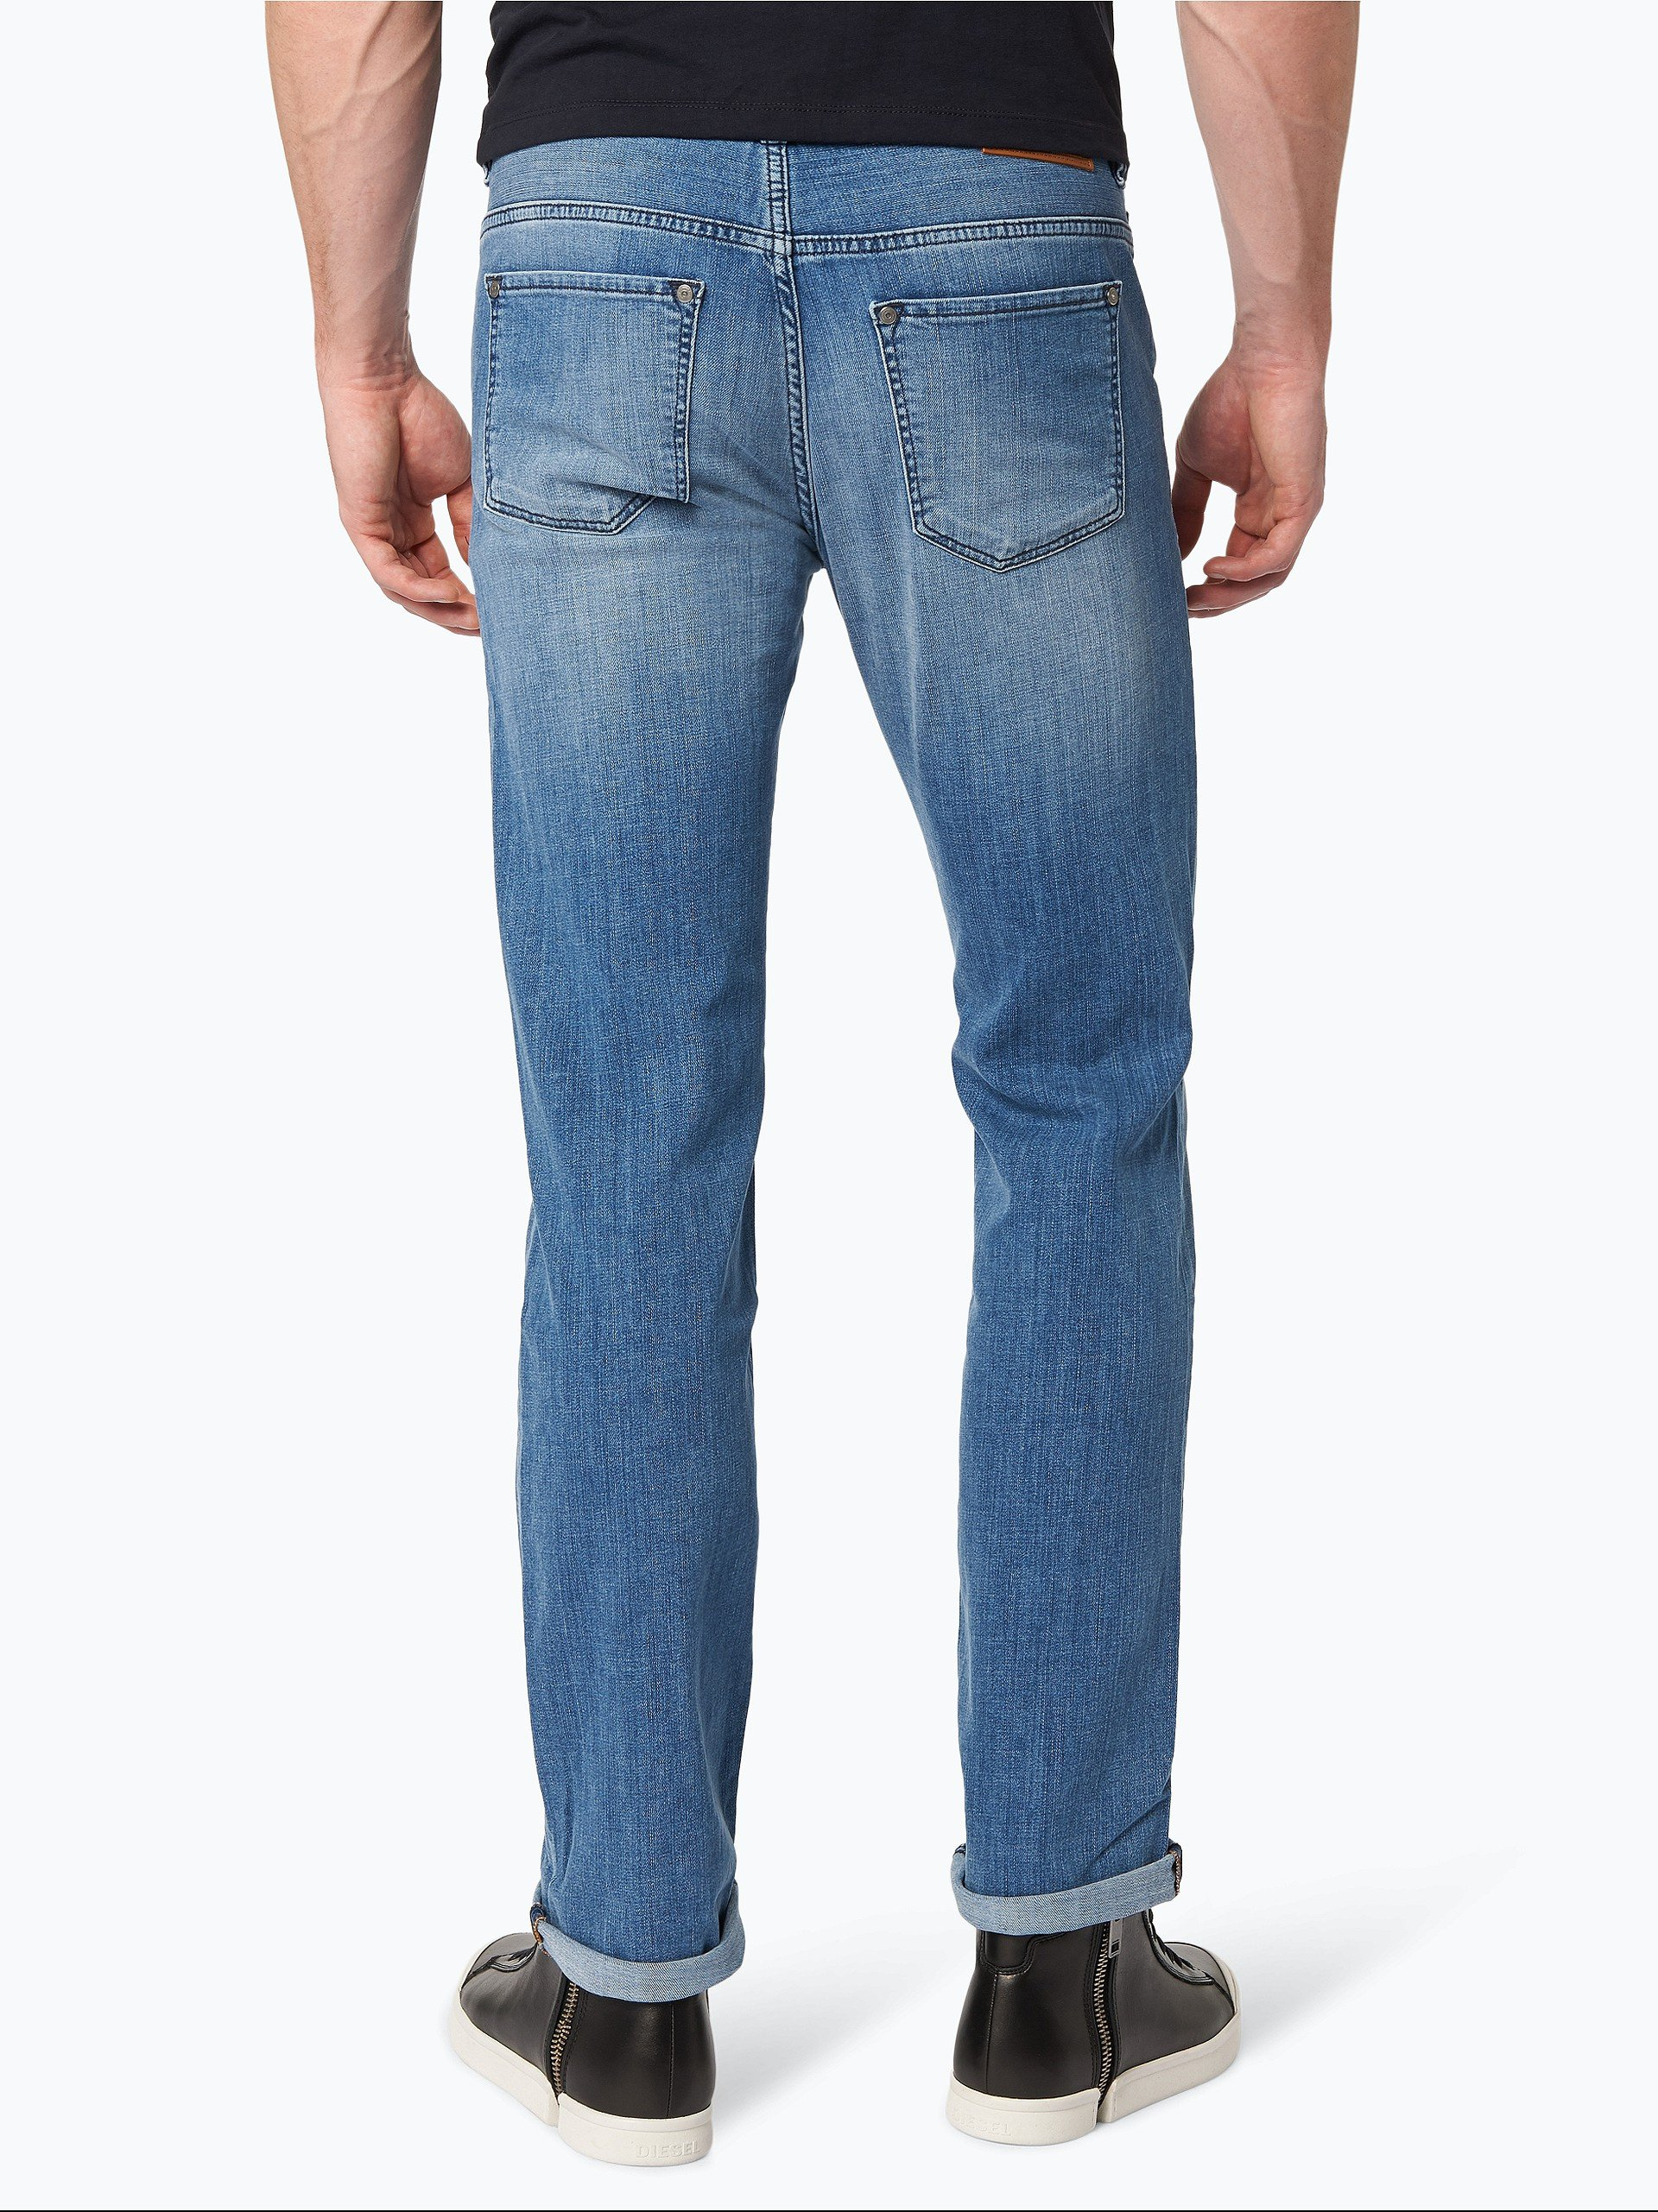 boss green herren jeans c kansas medium stone uni online kaufen vangraaf com. Black Bedroom Furniture Sets. Home Design Ideas